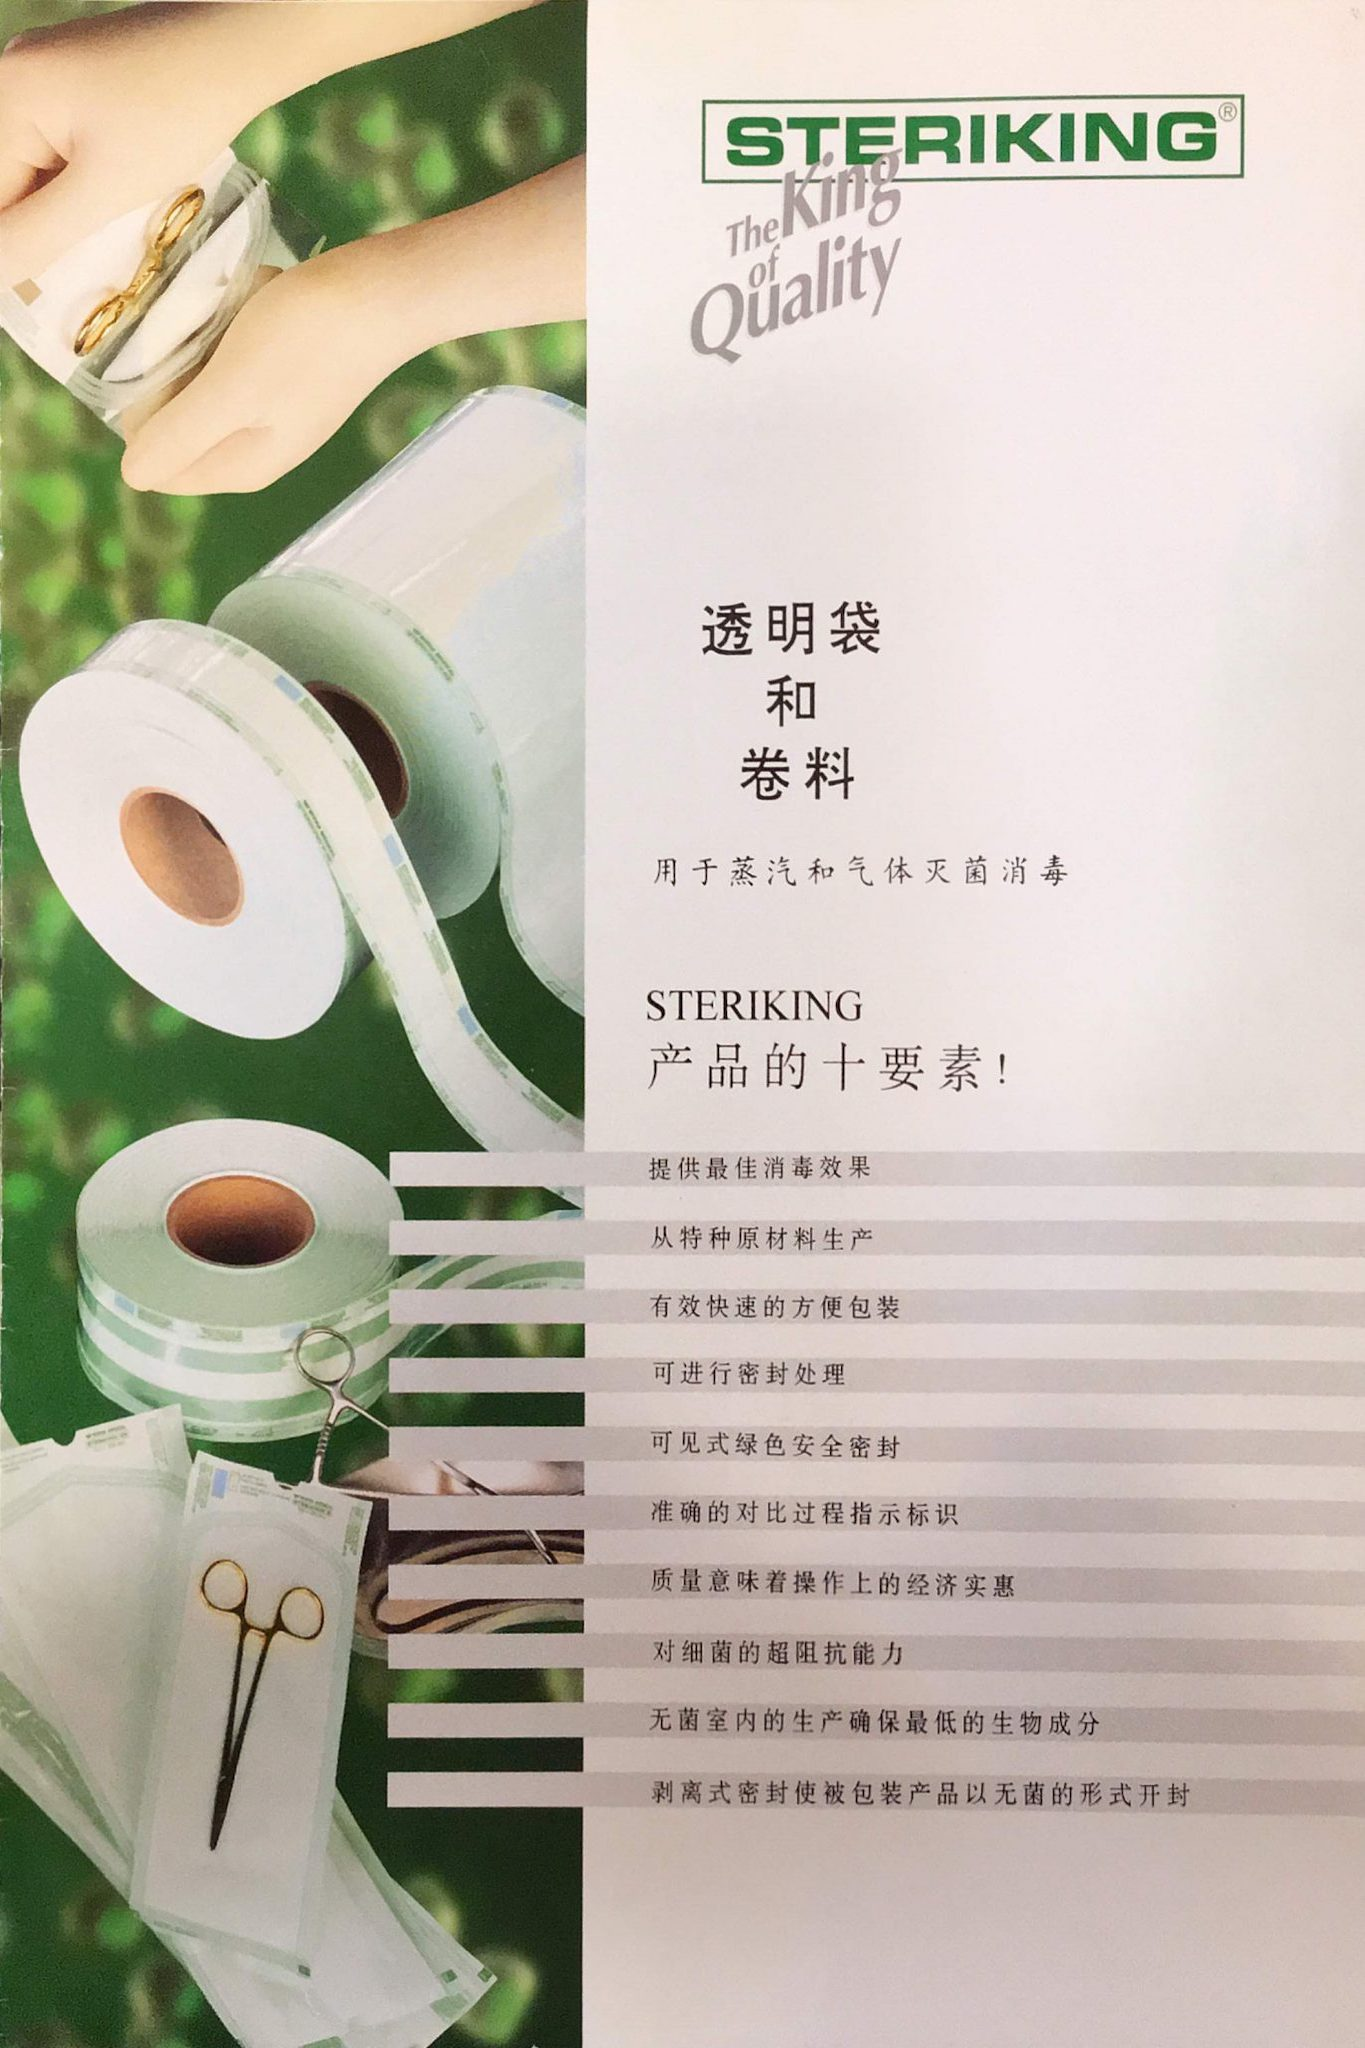 tekway-company-leaflets-brochures-steriking-e1585129546471-1372x2048